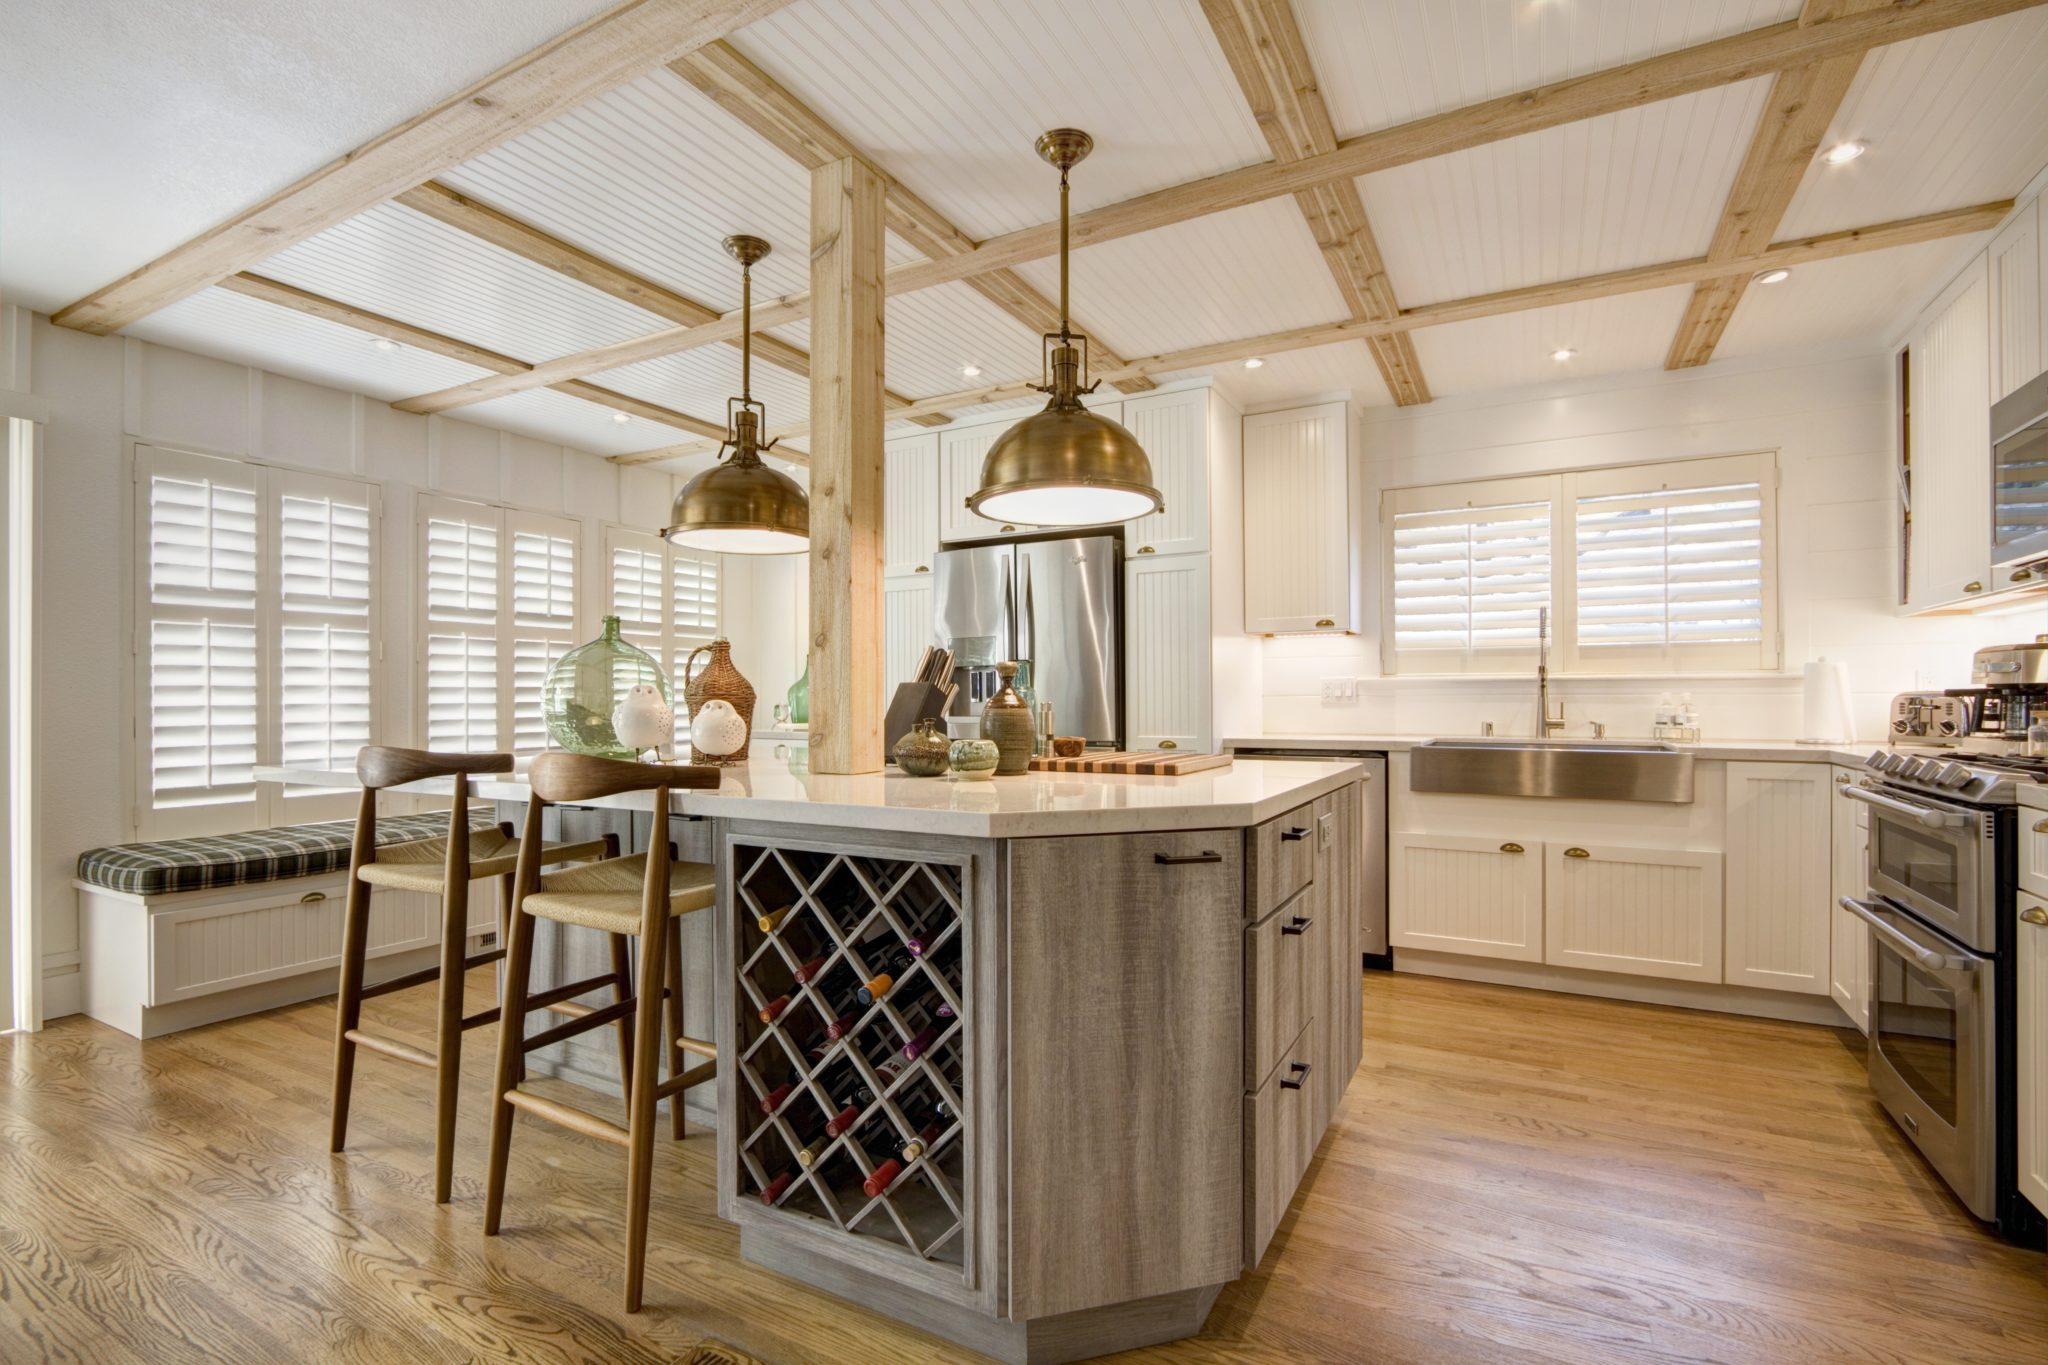 A charming kitchen by Scott Corridan Design